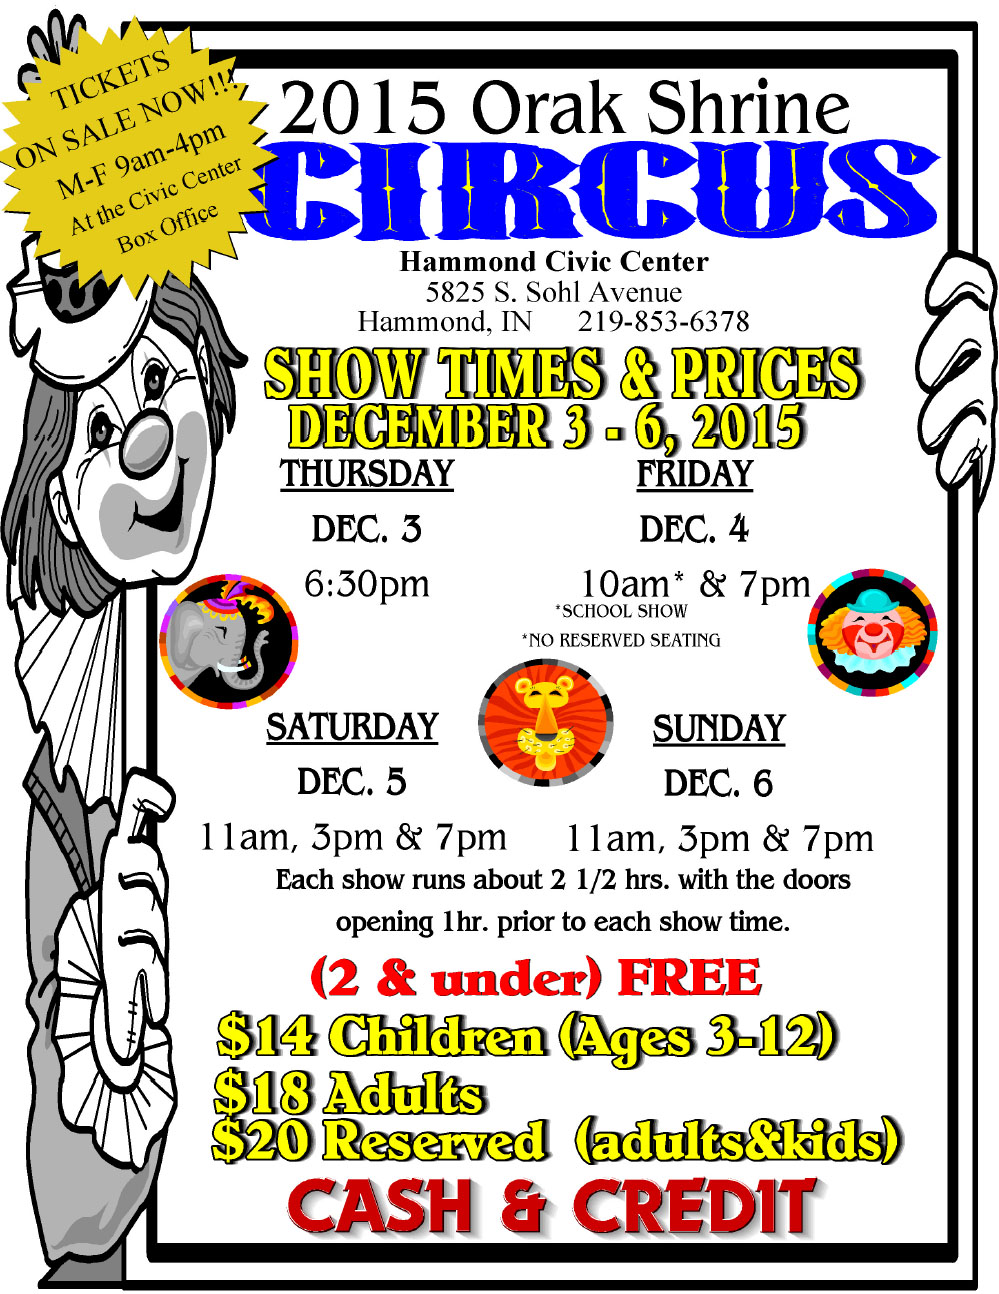 Orak Shrine Circus Returns to Hammond